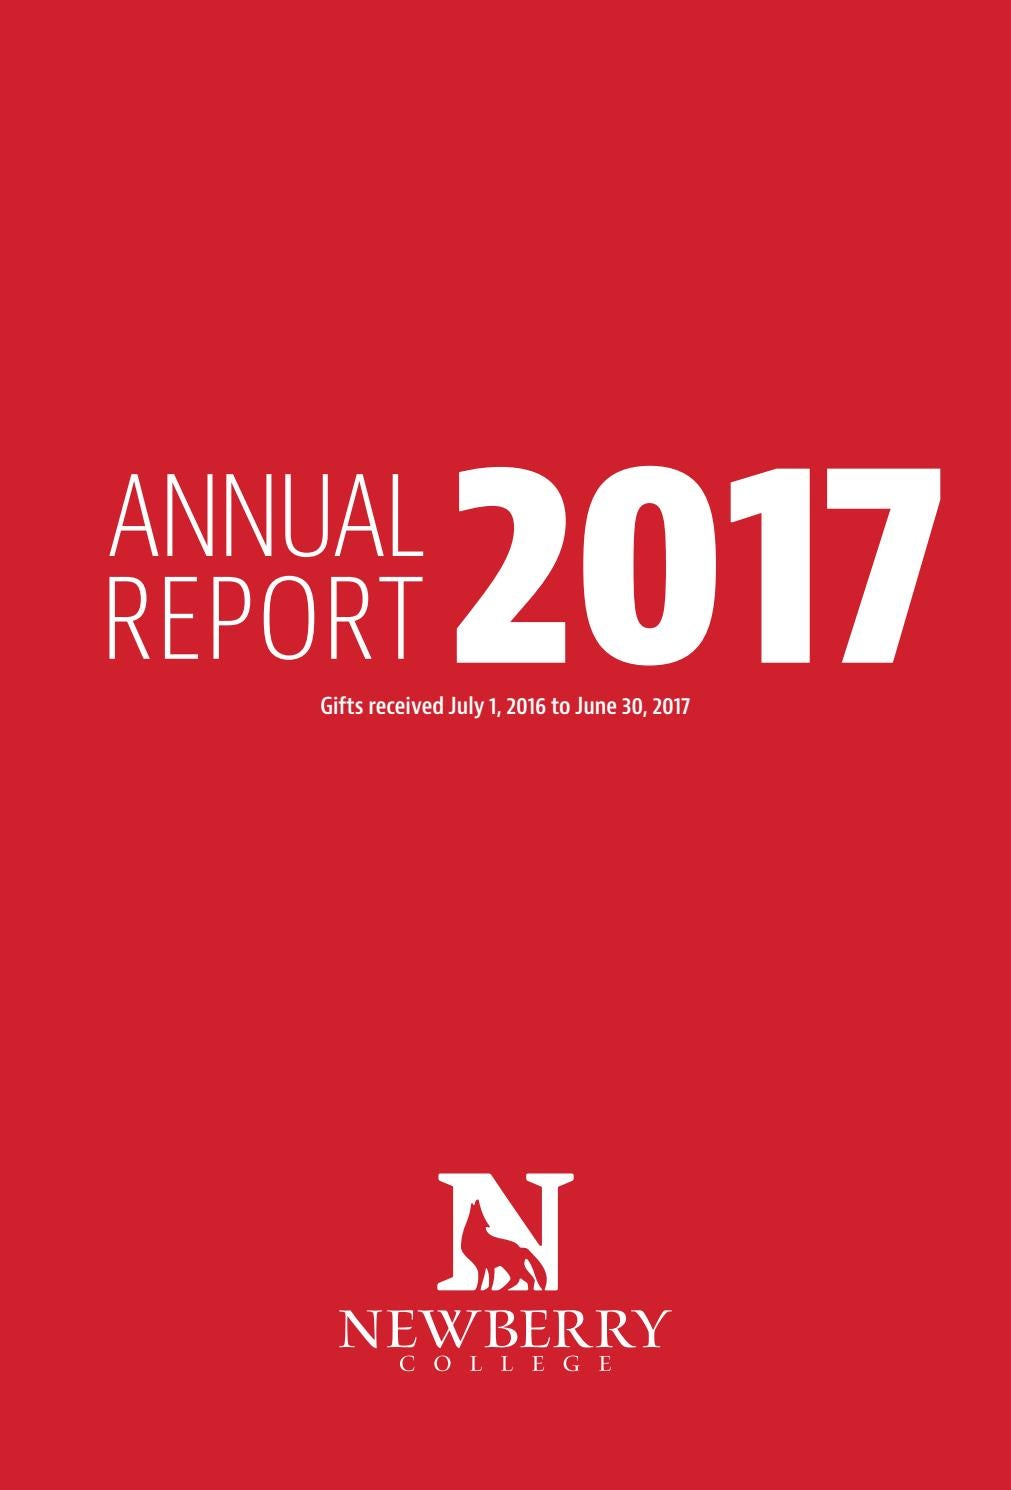 Newberry annual report 2017 issuu by Newberry College - issuu